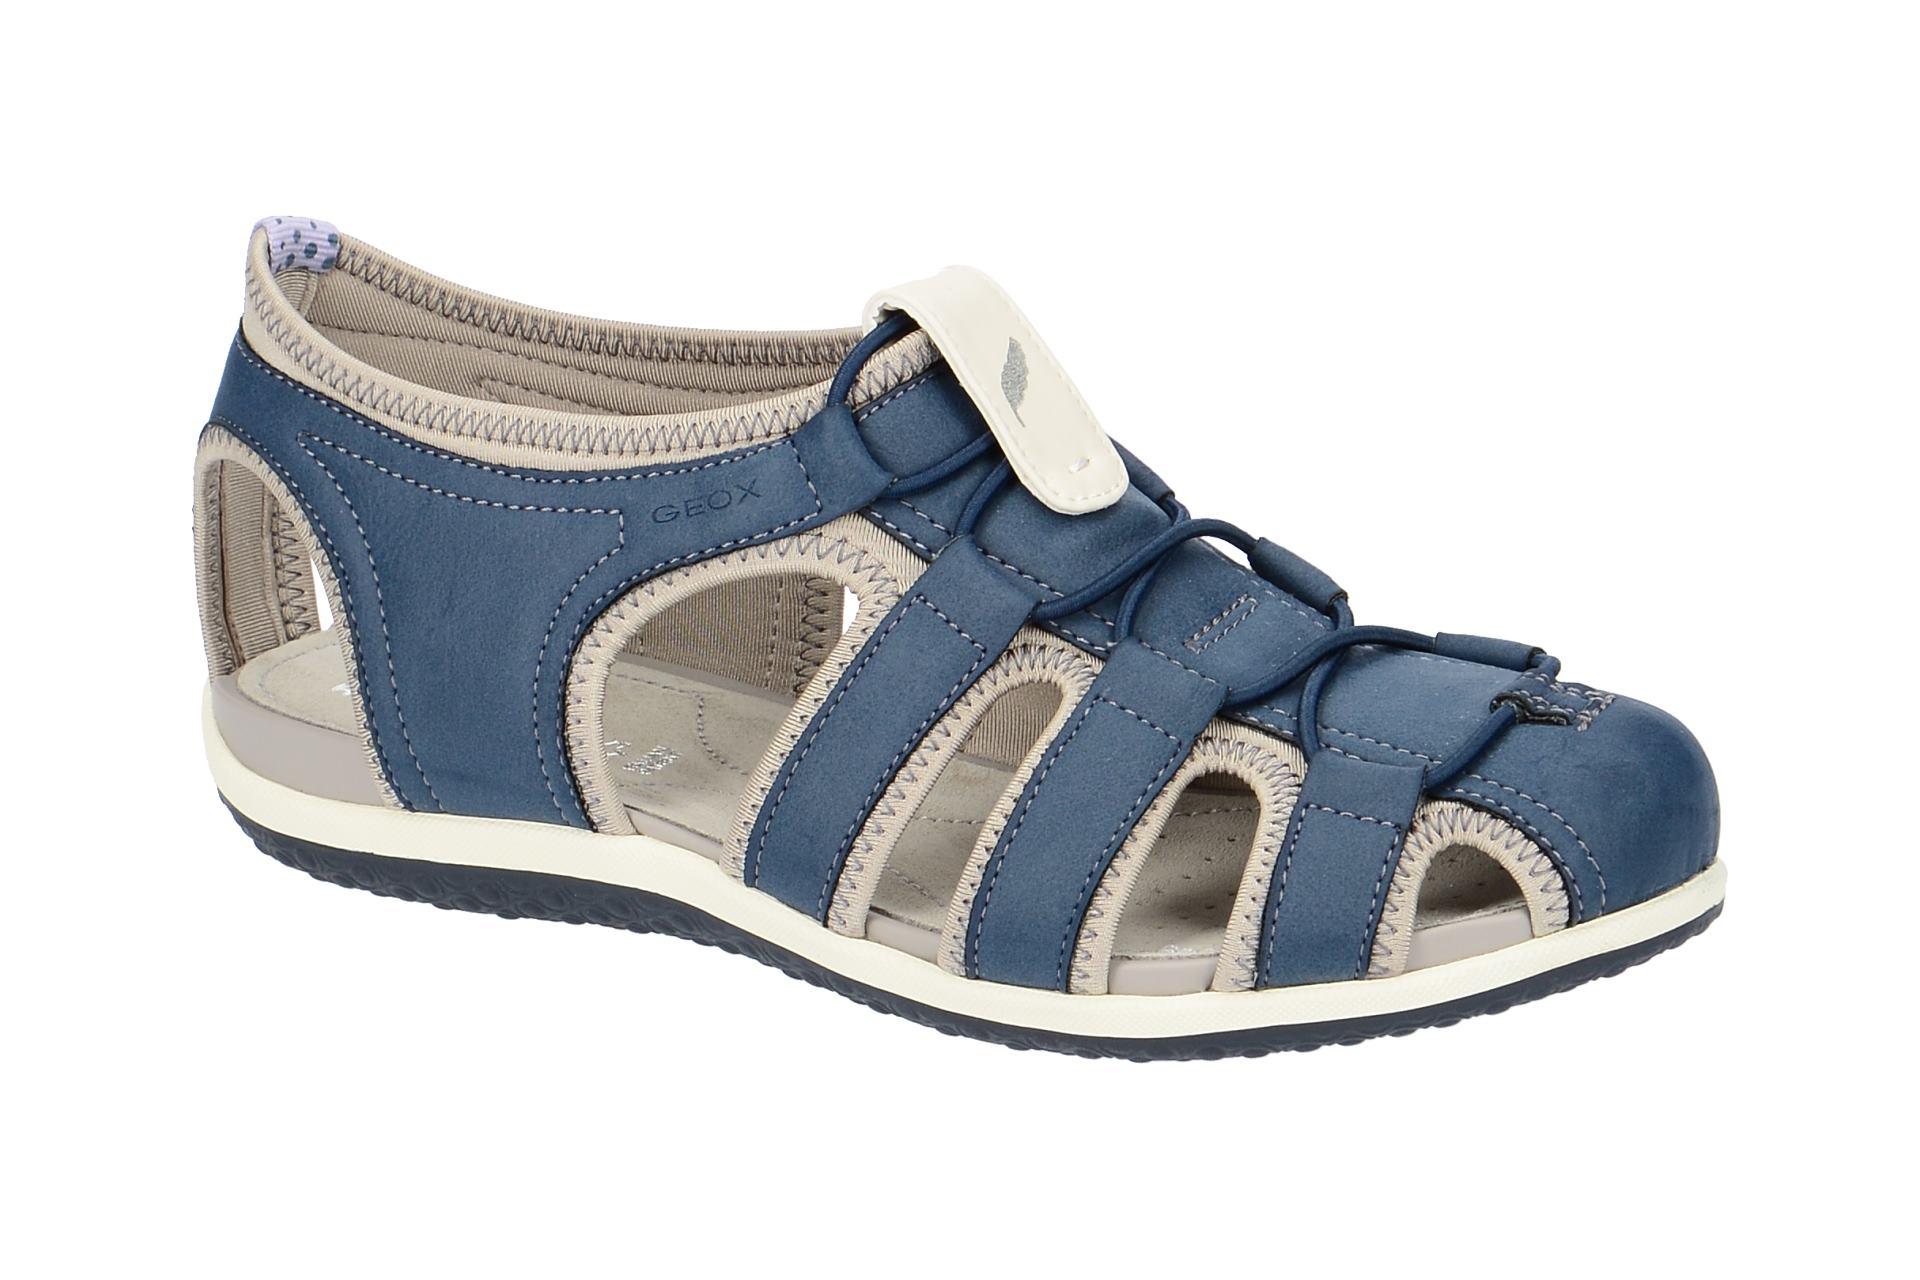 geox sandale vega blau d62r6d schuhhaus strauch shop. Black Bedroom Furniture Sets. Home Design Ideas